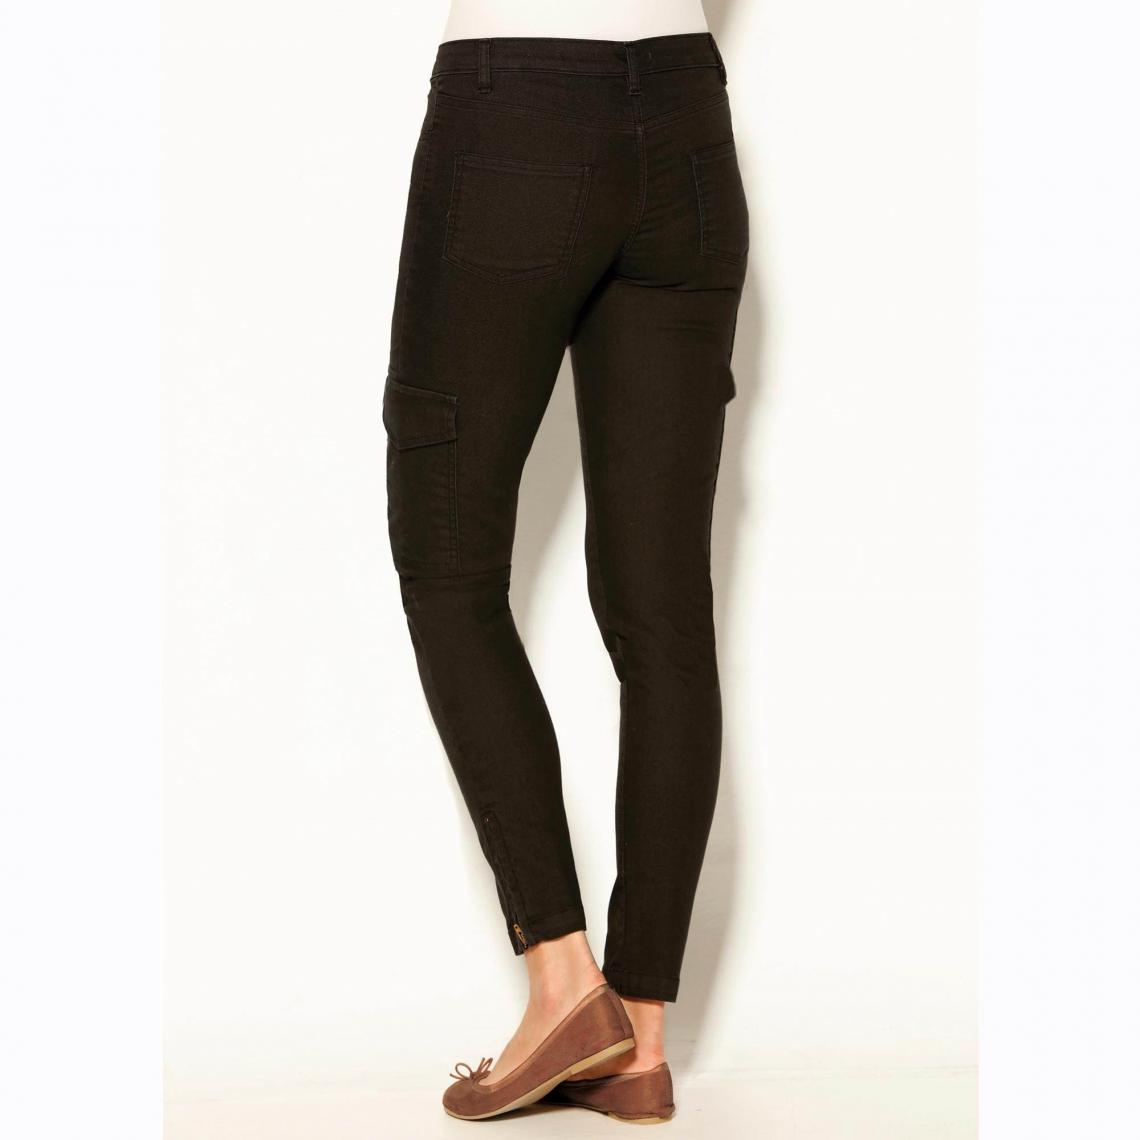 Pantalon multipoches bas zippés - 3 SUISSES - Modalova